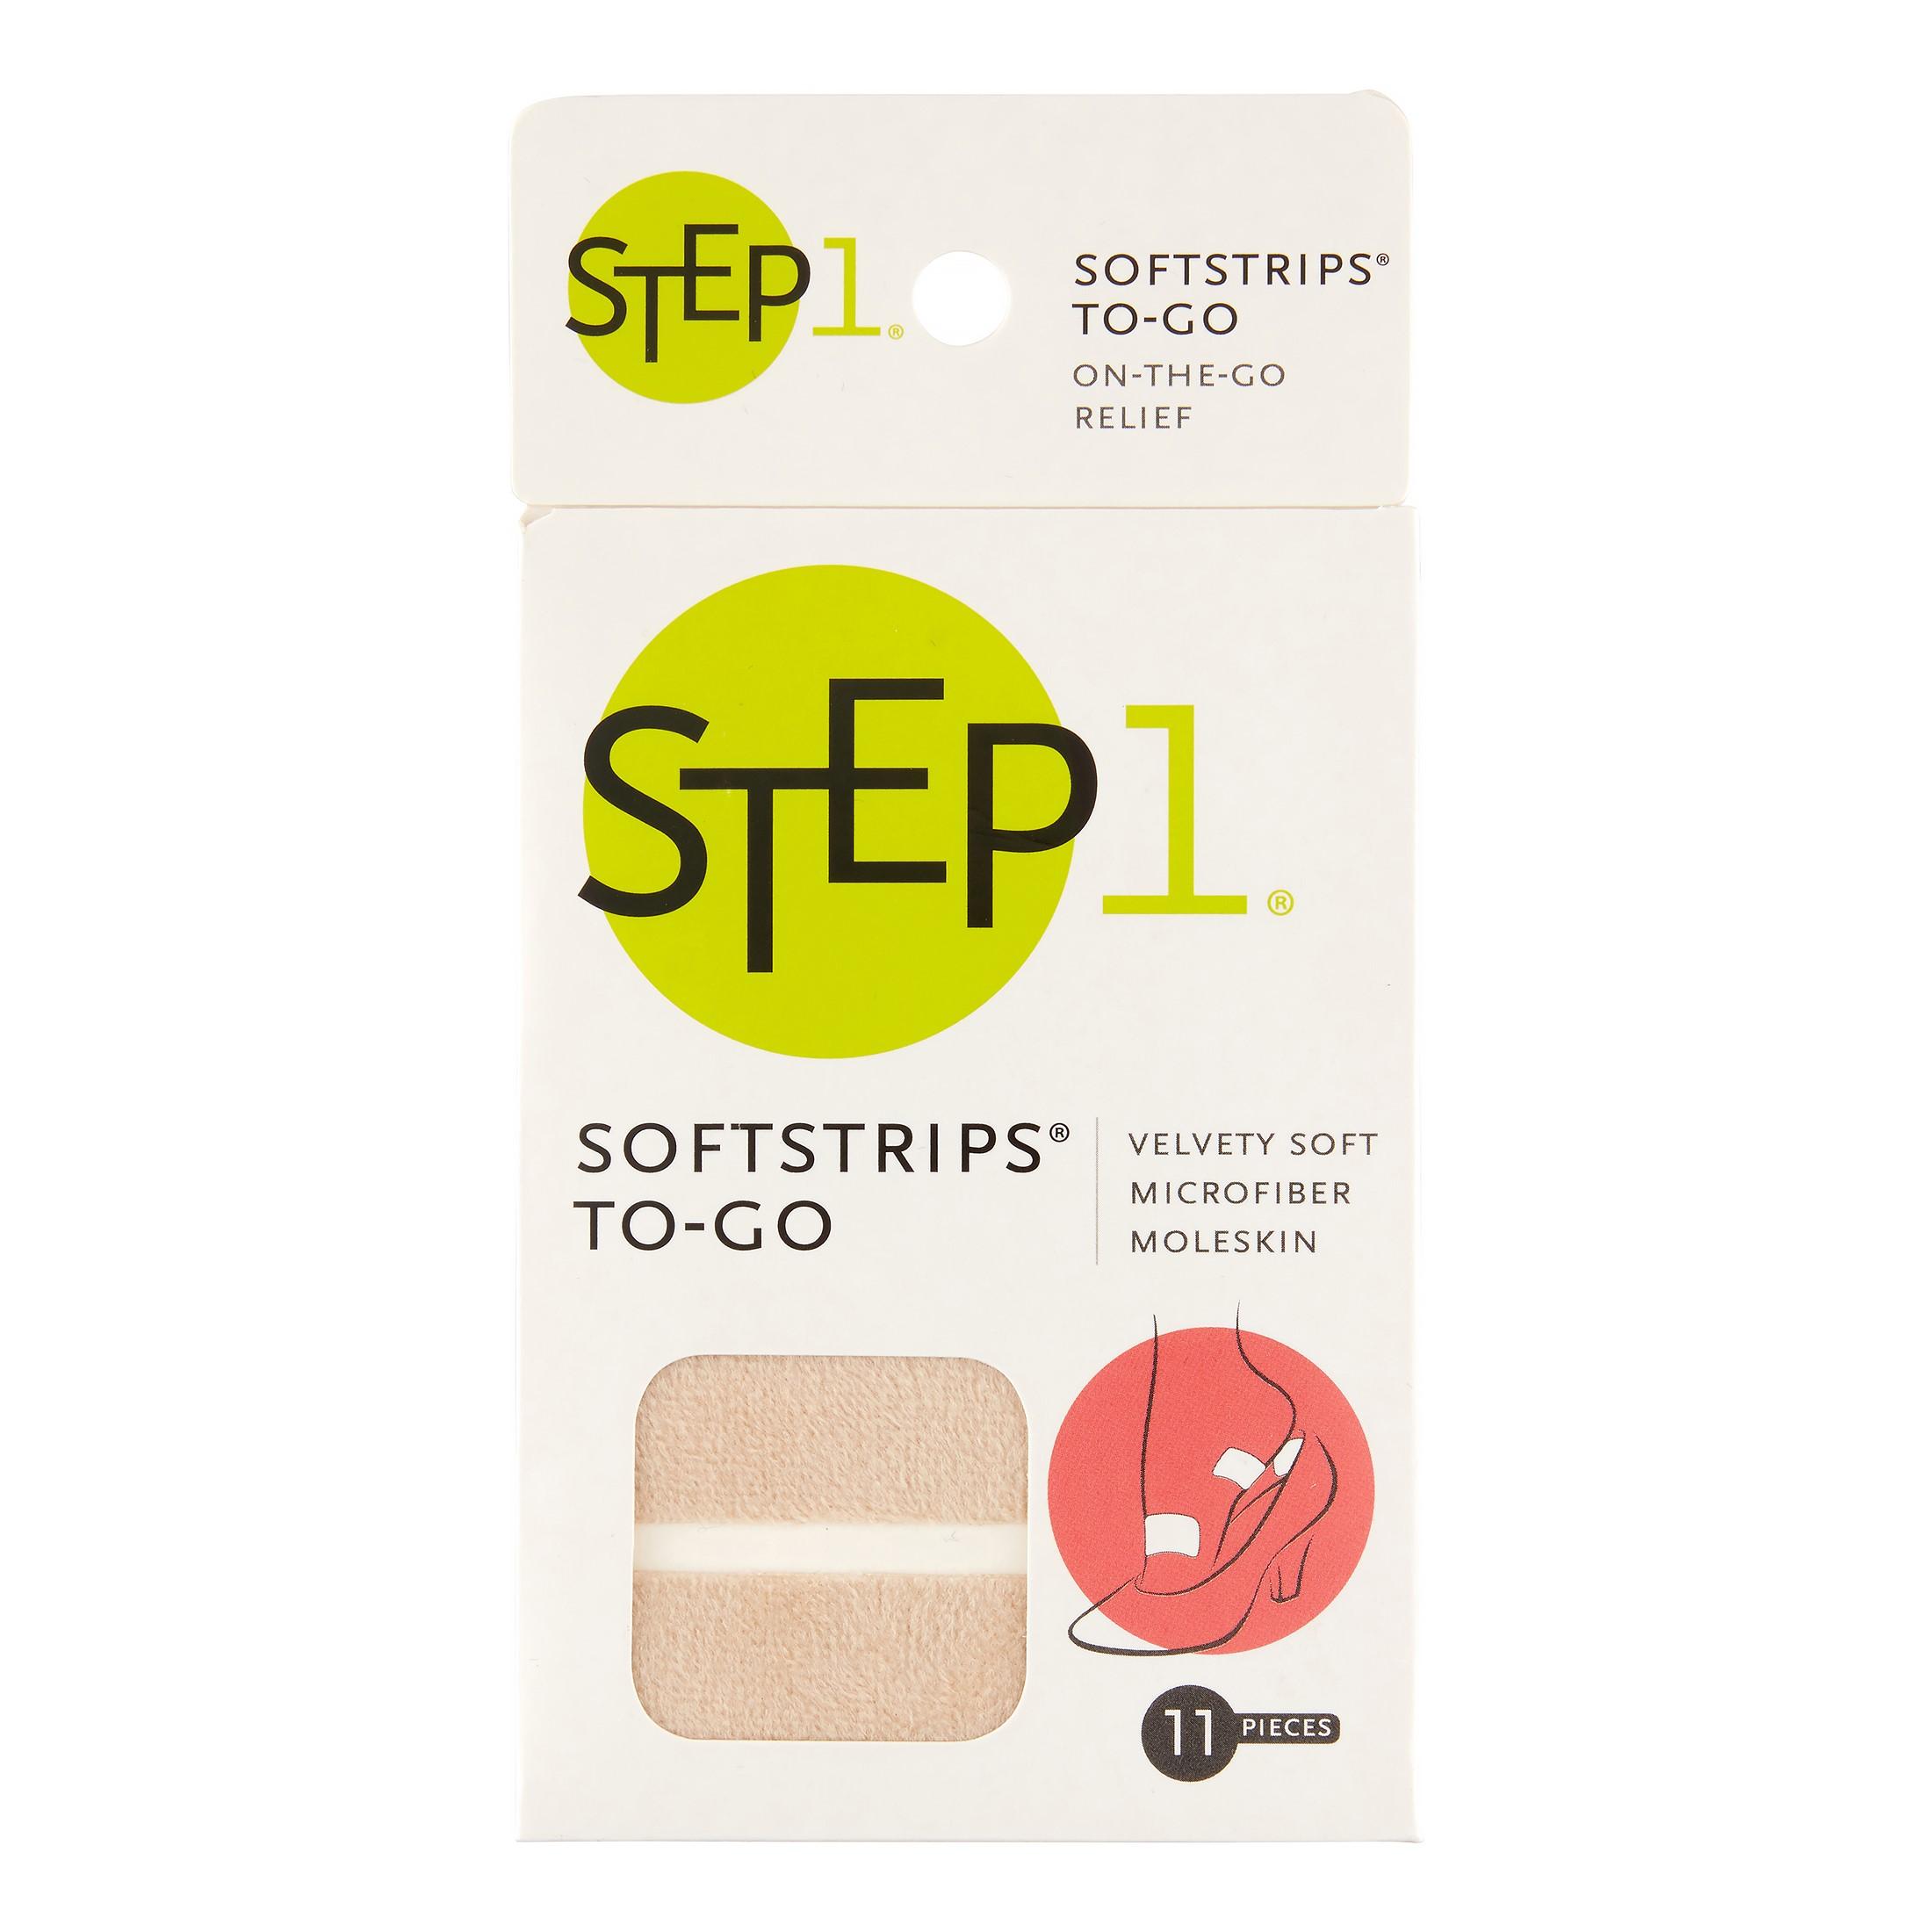 ProFoot Step 1 Softstrips To-Go Microfiber Moleskin, 11 Ct